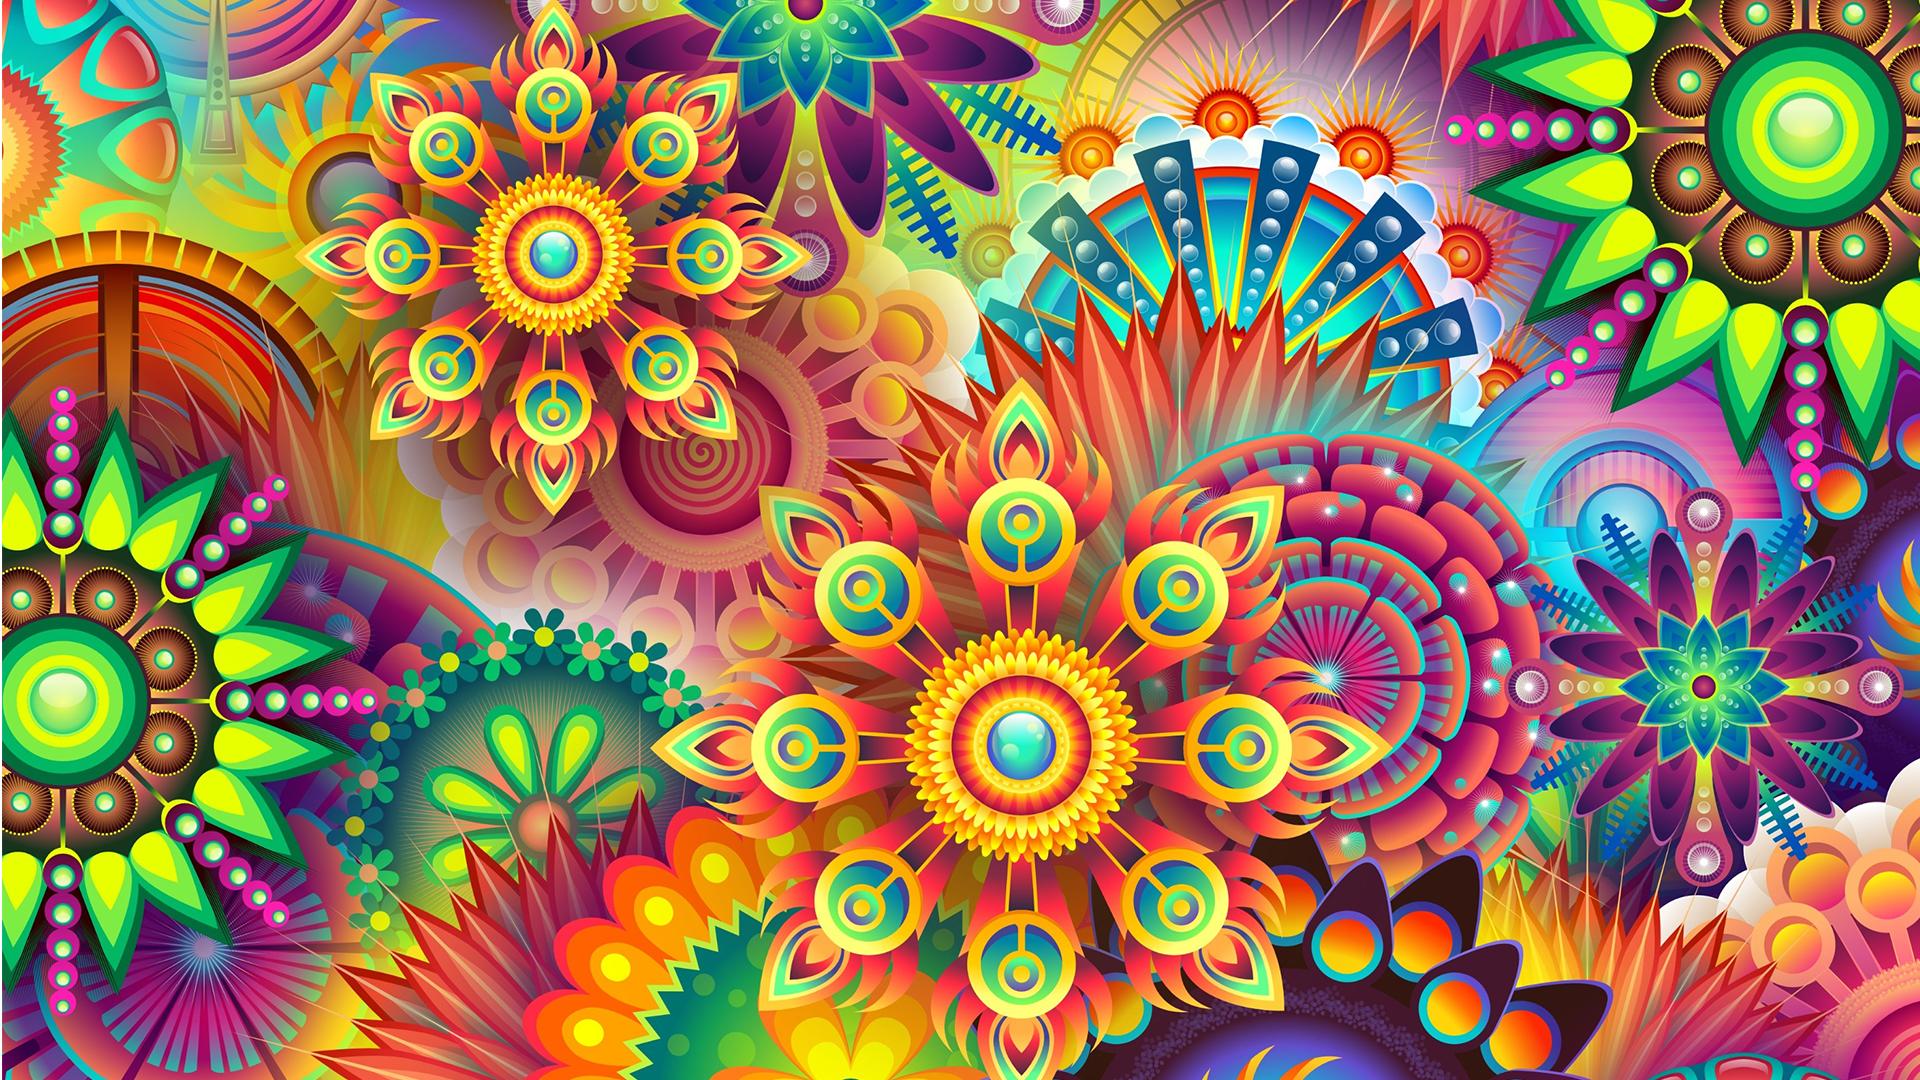 Paleta de cores por nome - designMídia